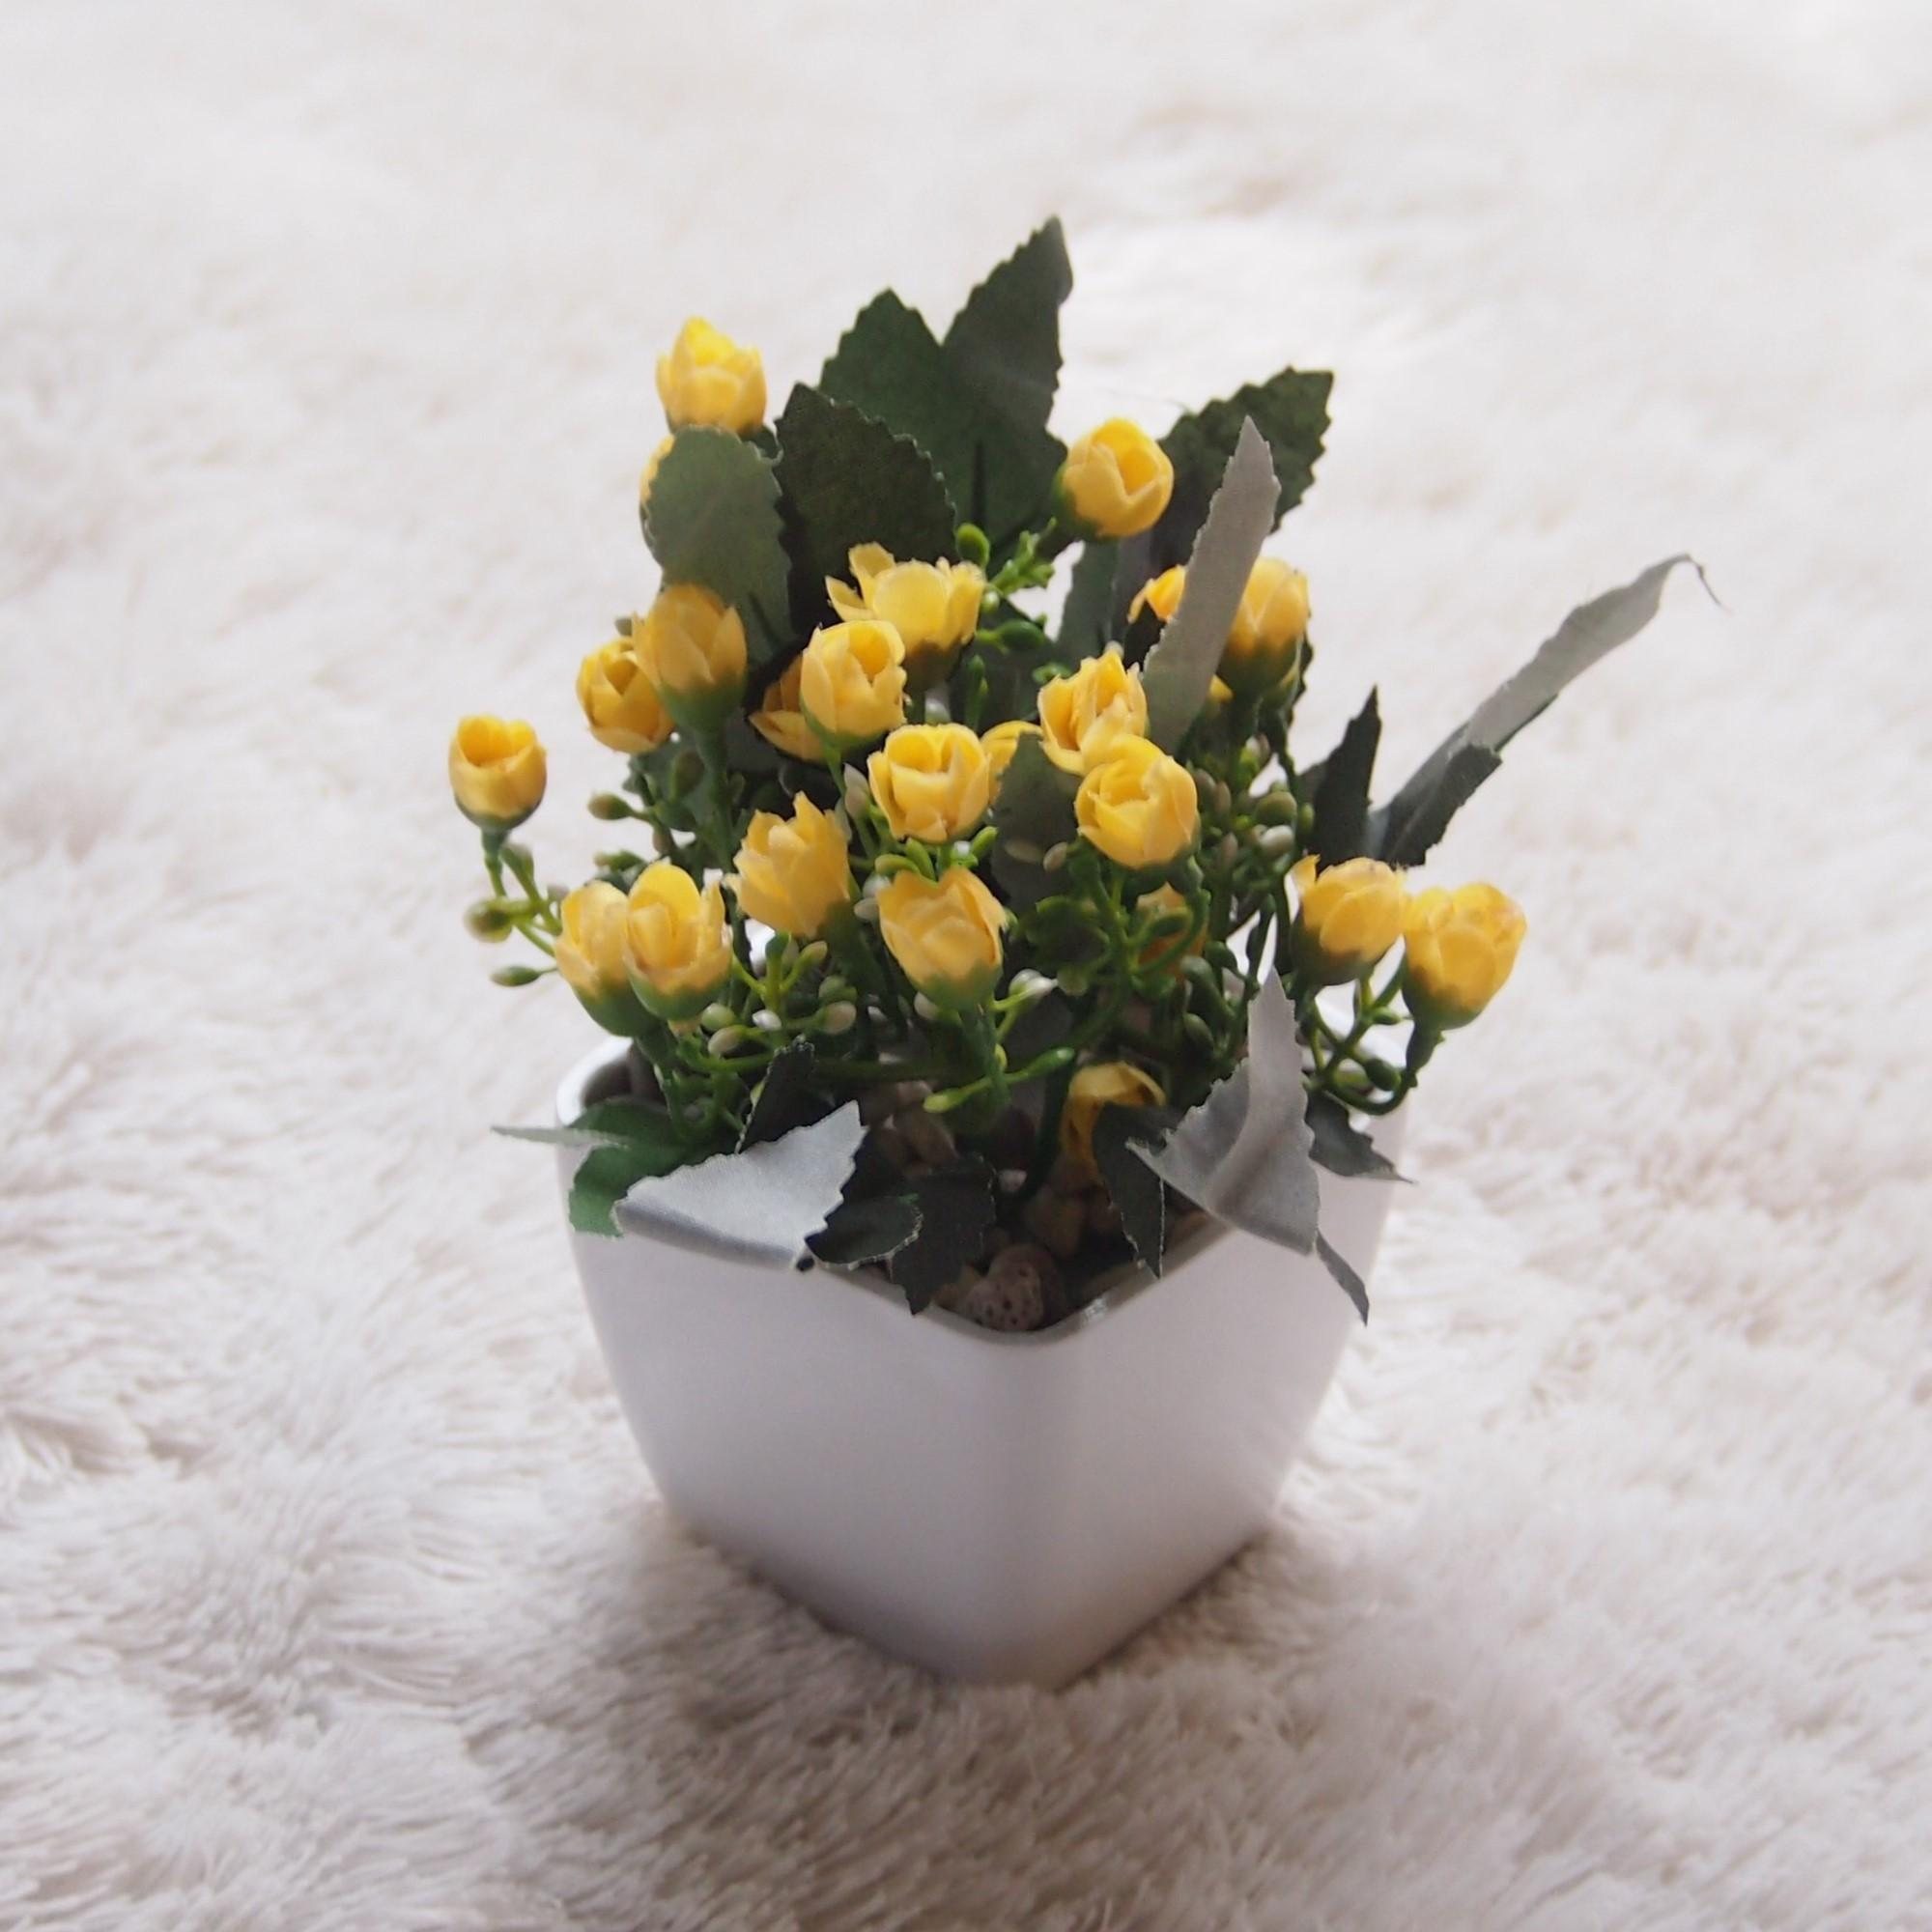 Bunga Artificial Hiasan Dan Dekorasi Ruangan Tiny Rose Pot Kotak Tr02